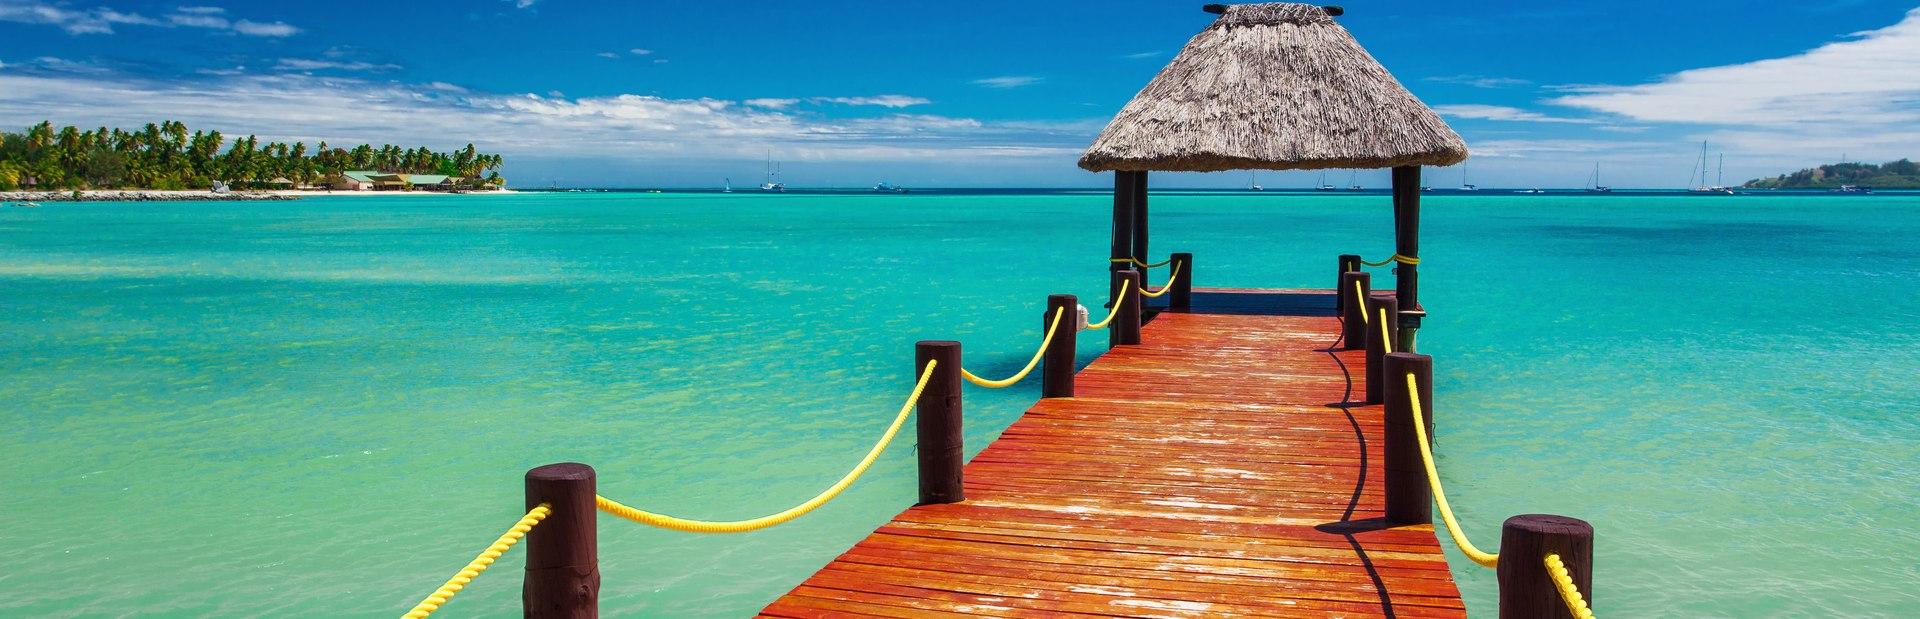 6 reasons to visit Fiji on a luxury yacht charter